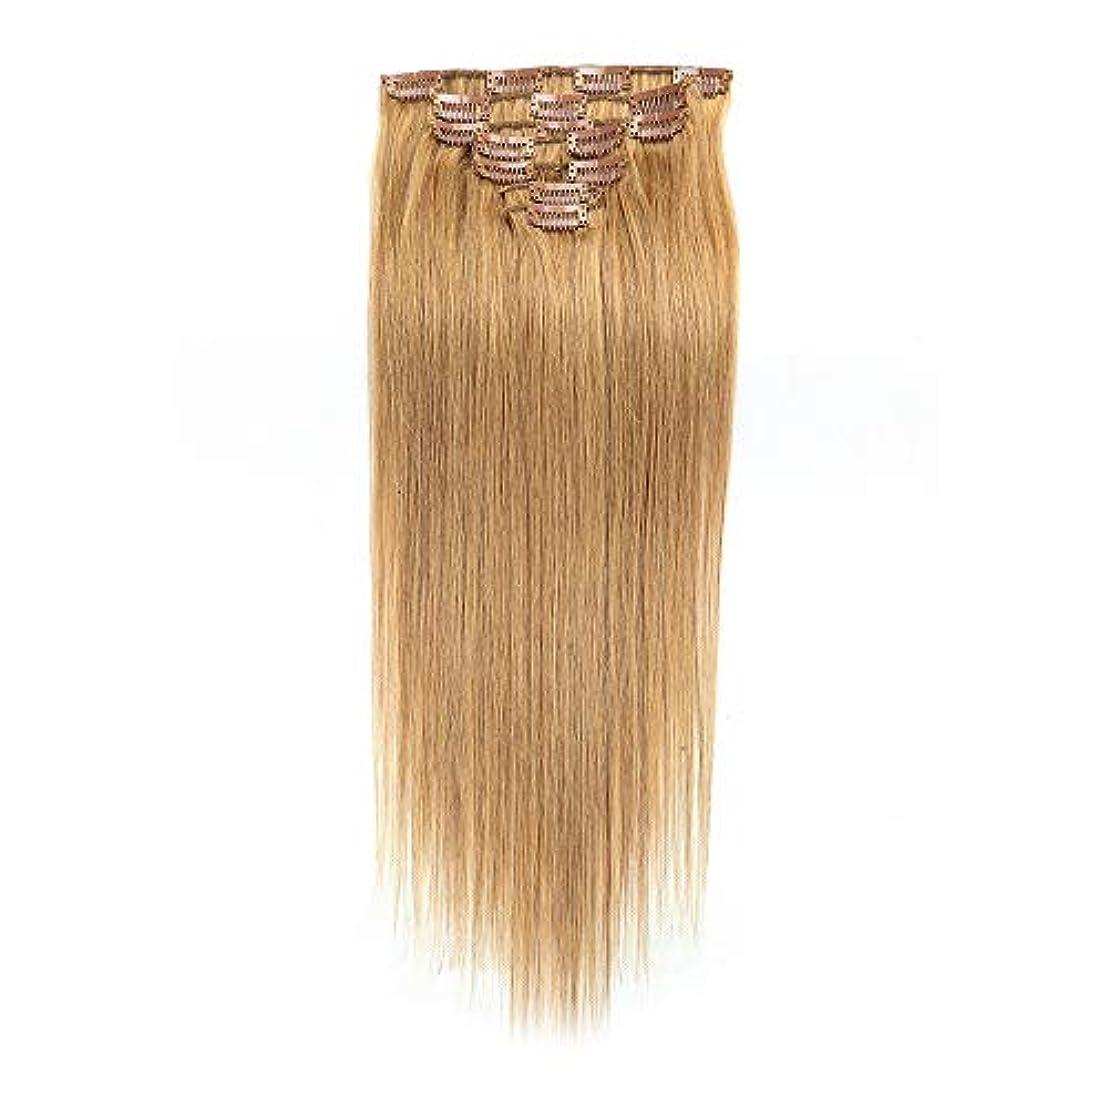 HOHYLLYA ヘアエクステンション人間の髪の毛の色#27ブロンド22インチストレートヘアロールプレイングかつら女性のかつら (色 : #27 blonde)